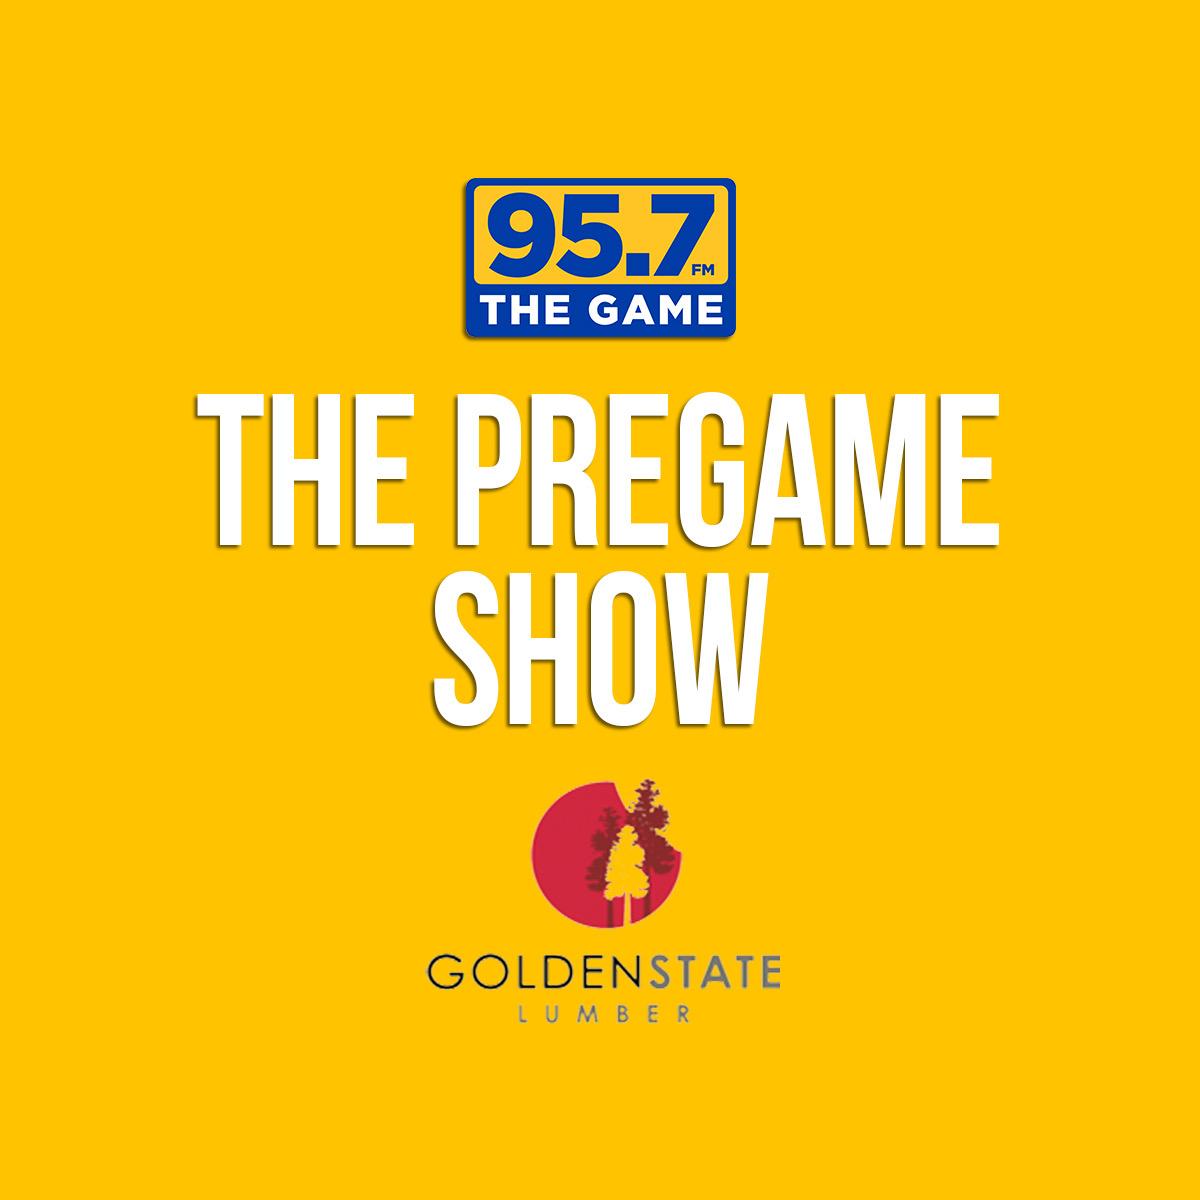 95 7 THE GAME on Radio com: Listen to Free Radio Online